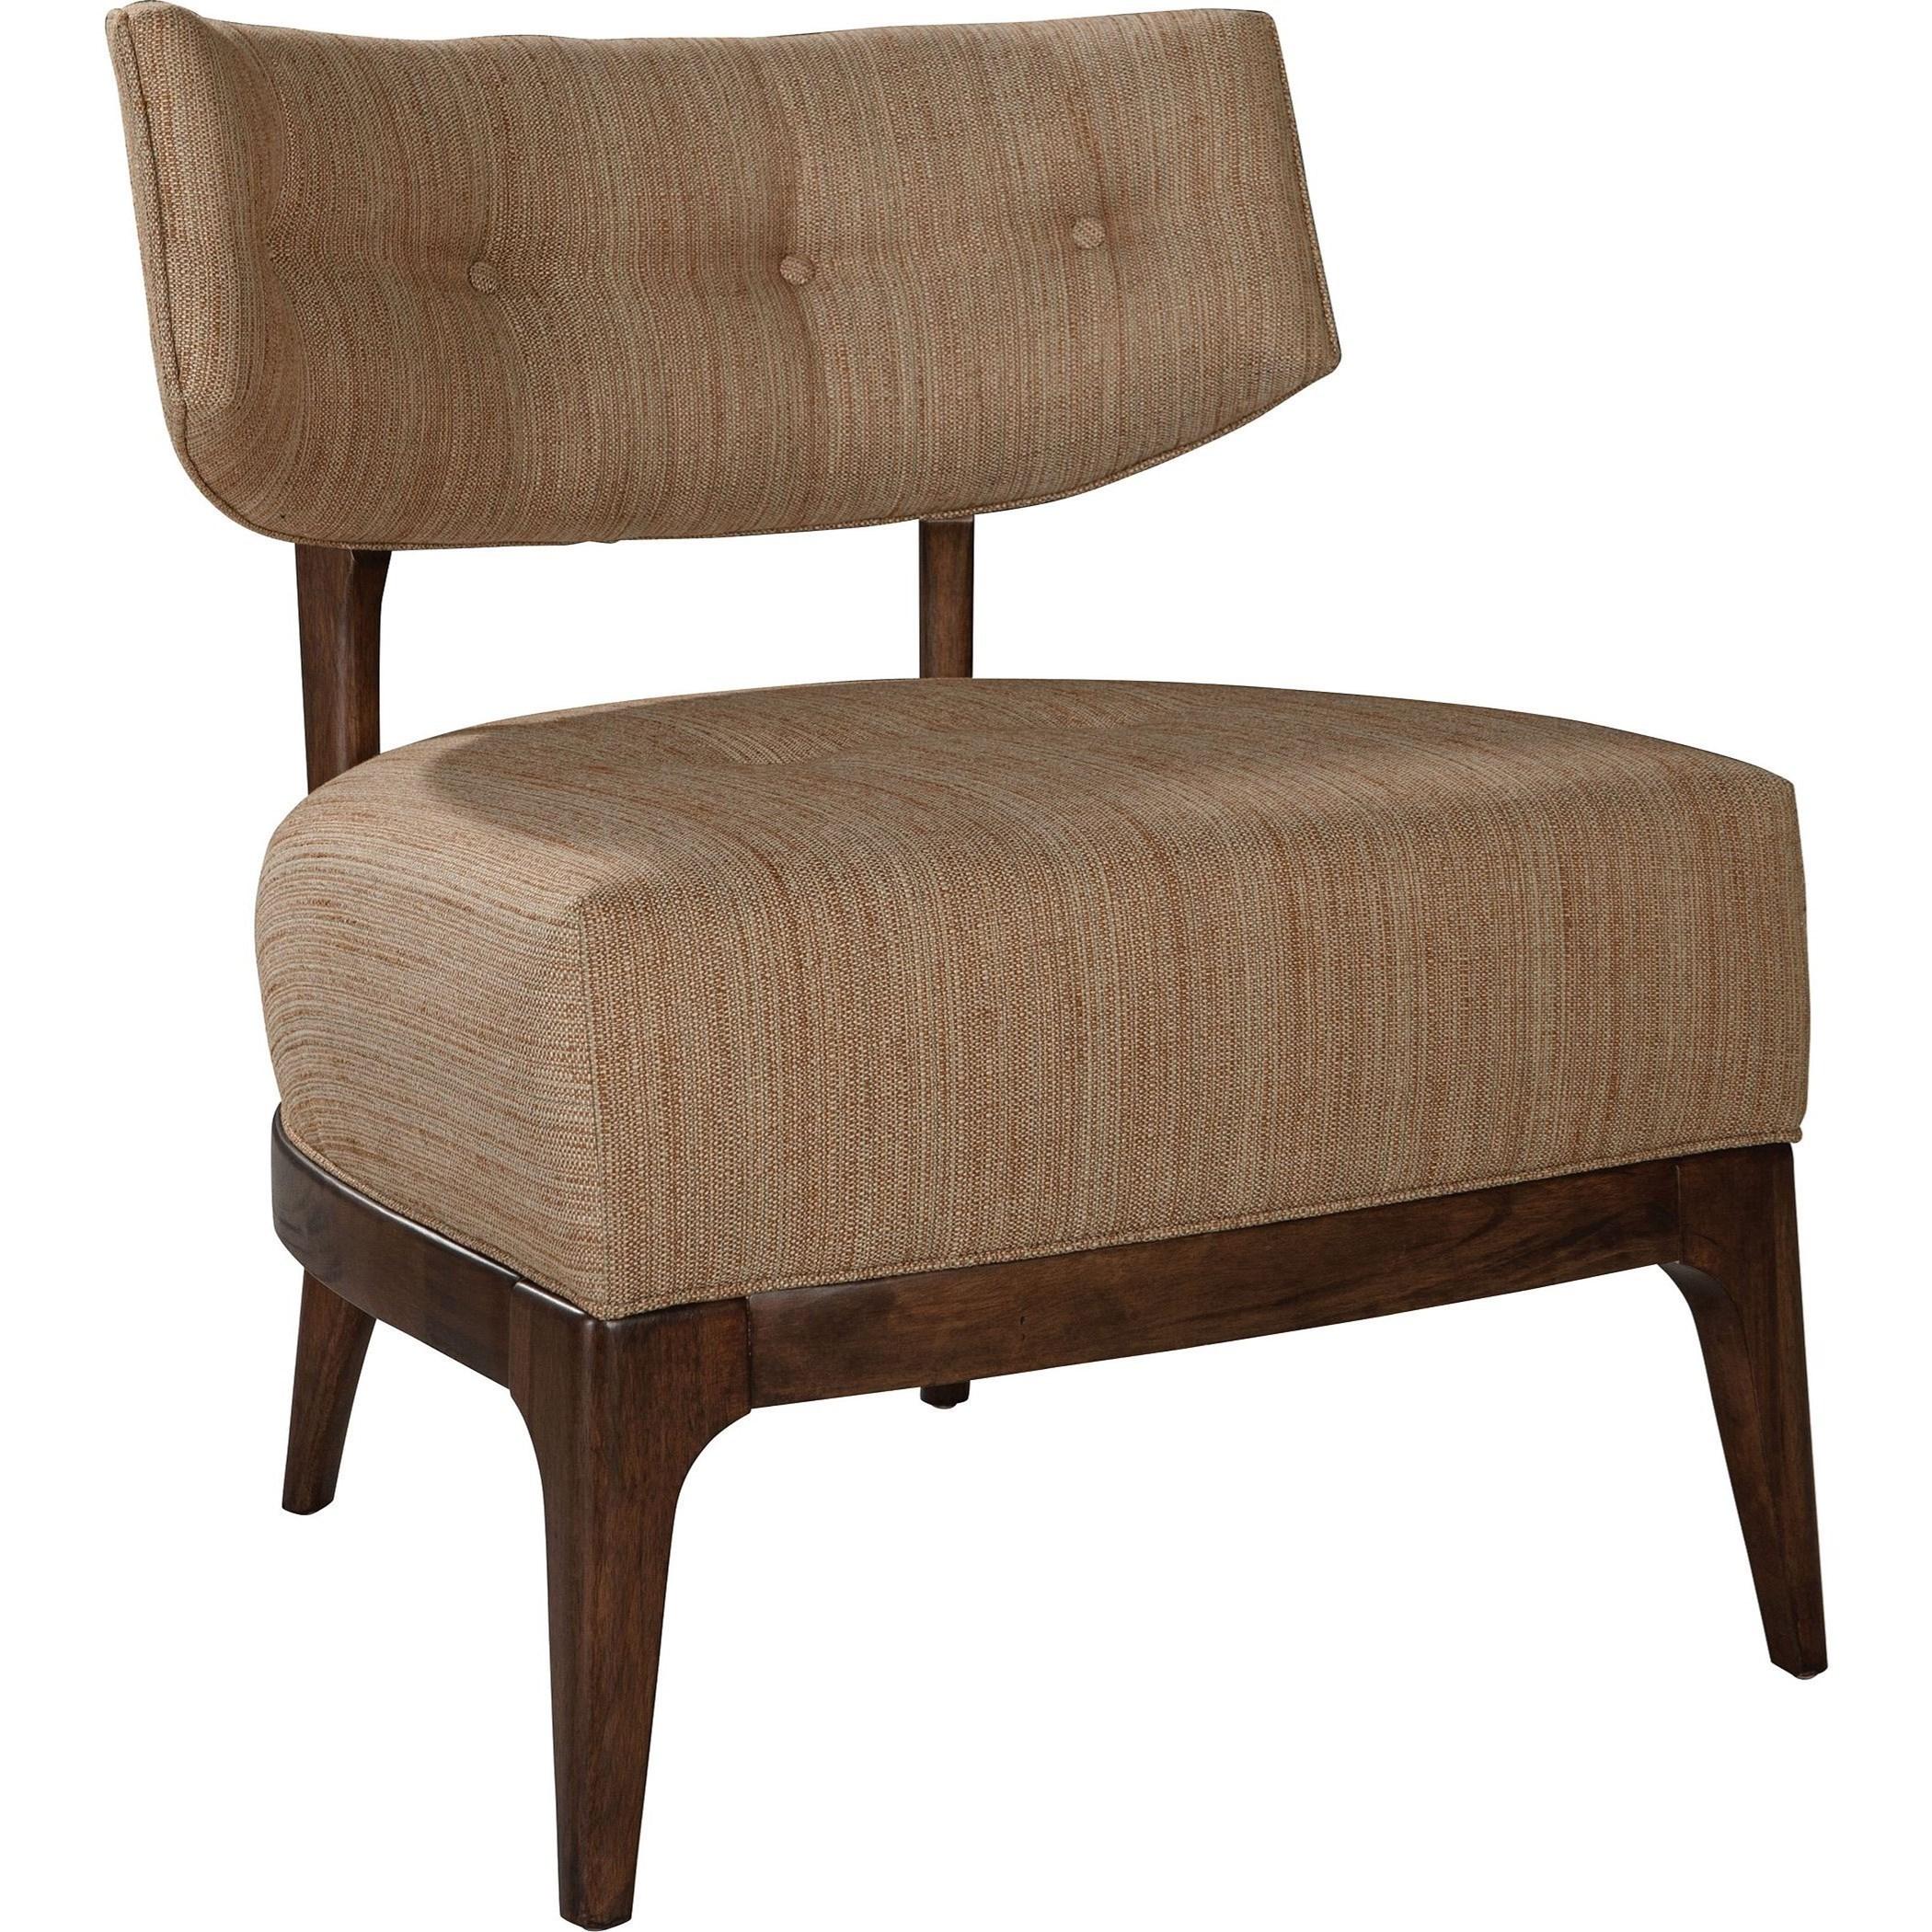 ED Ellen DeGeneres Crafted by Thomasville   Stradella Chair - Item Number: 2665-15-1027-24